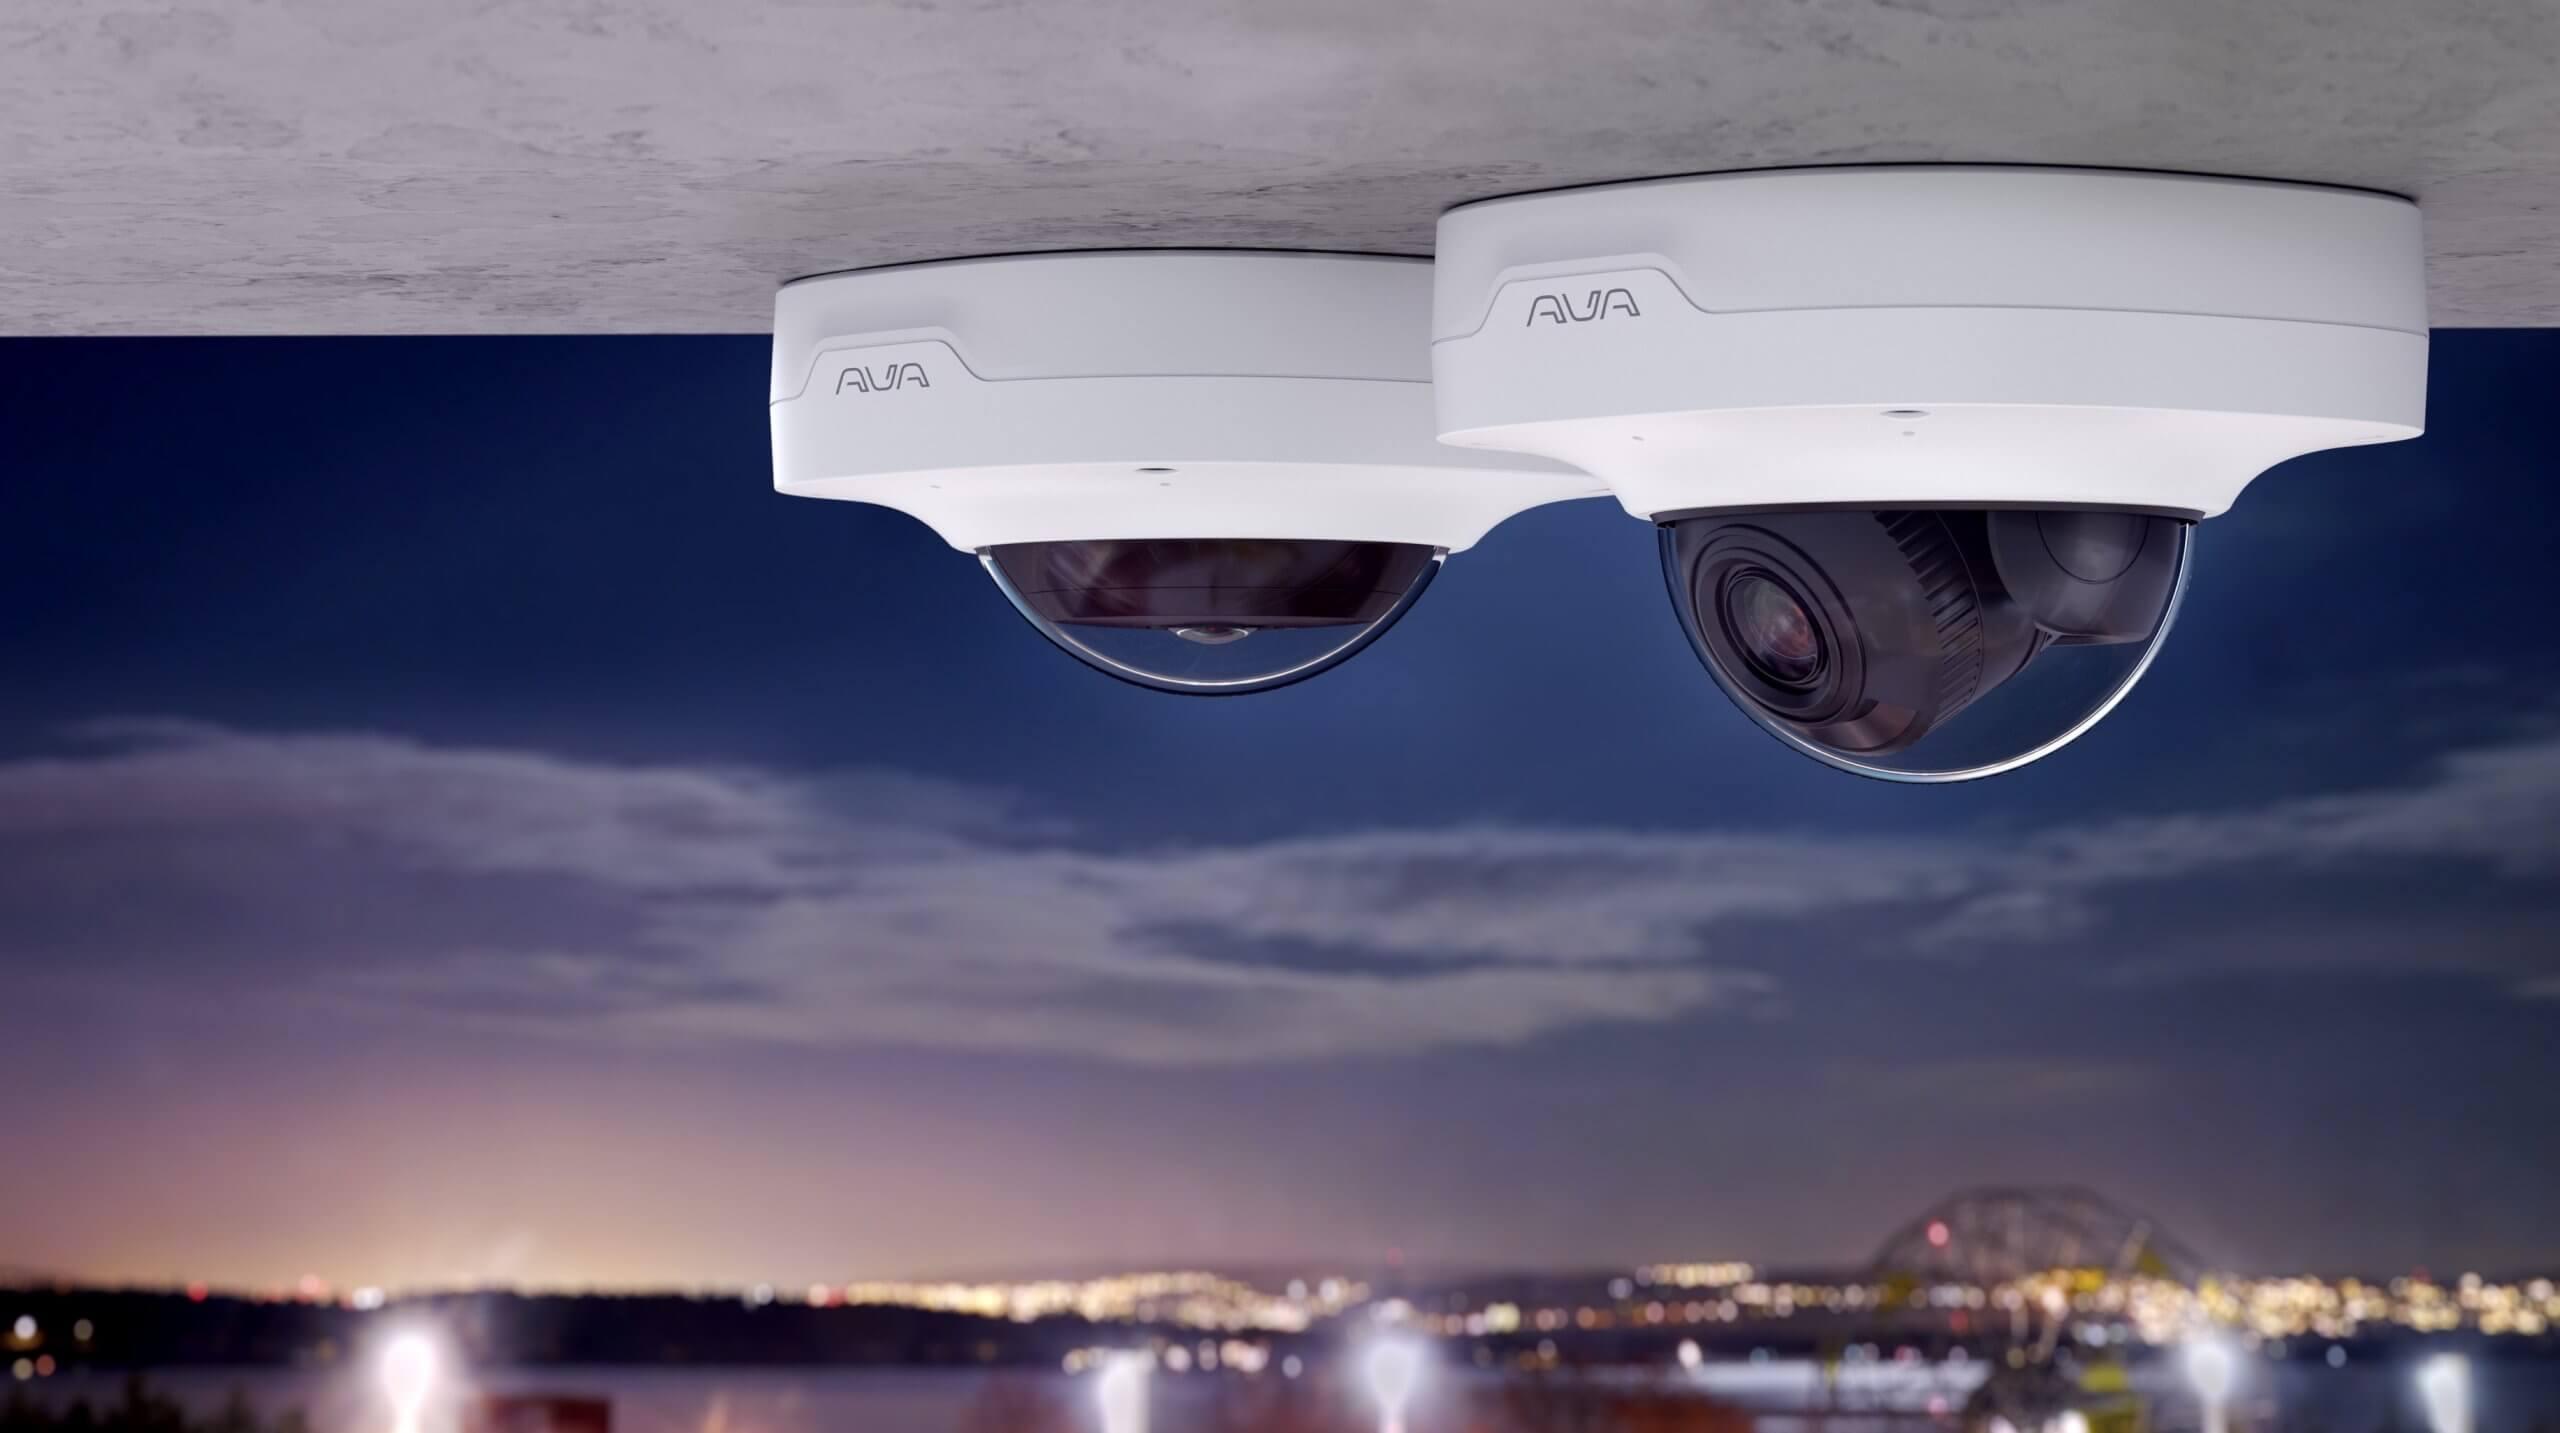 KI-basierte Videoüberwachung